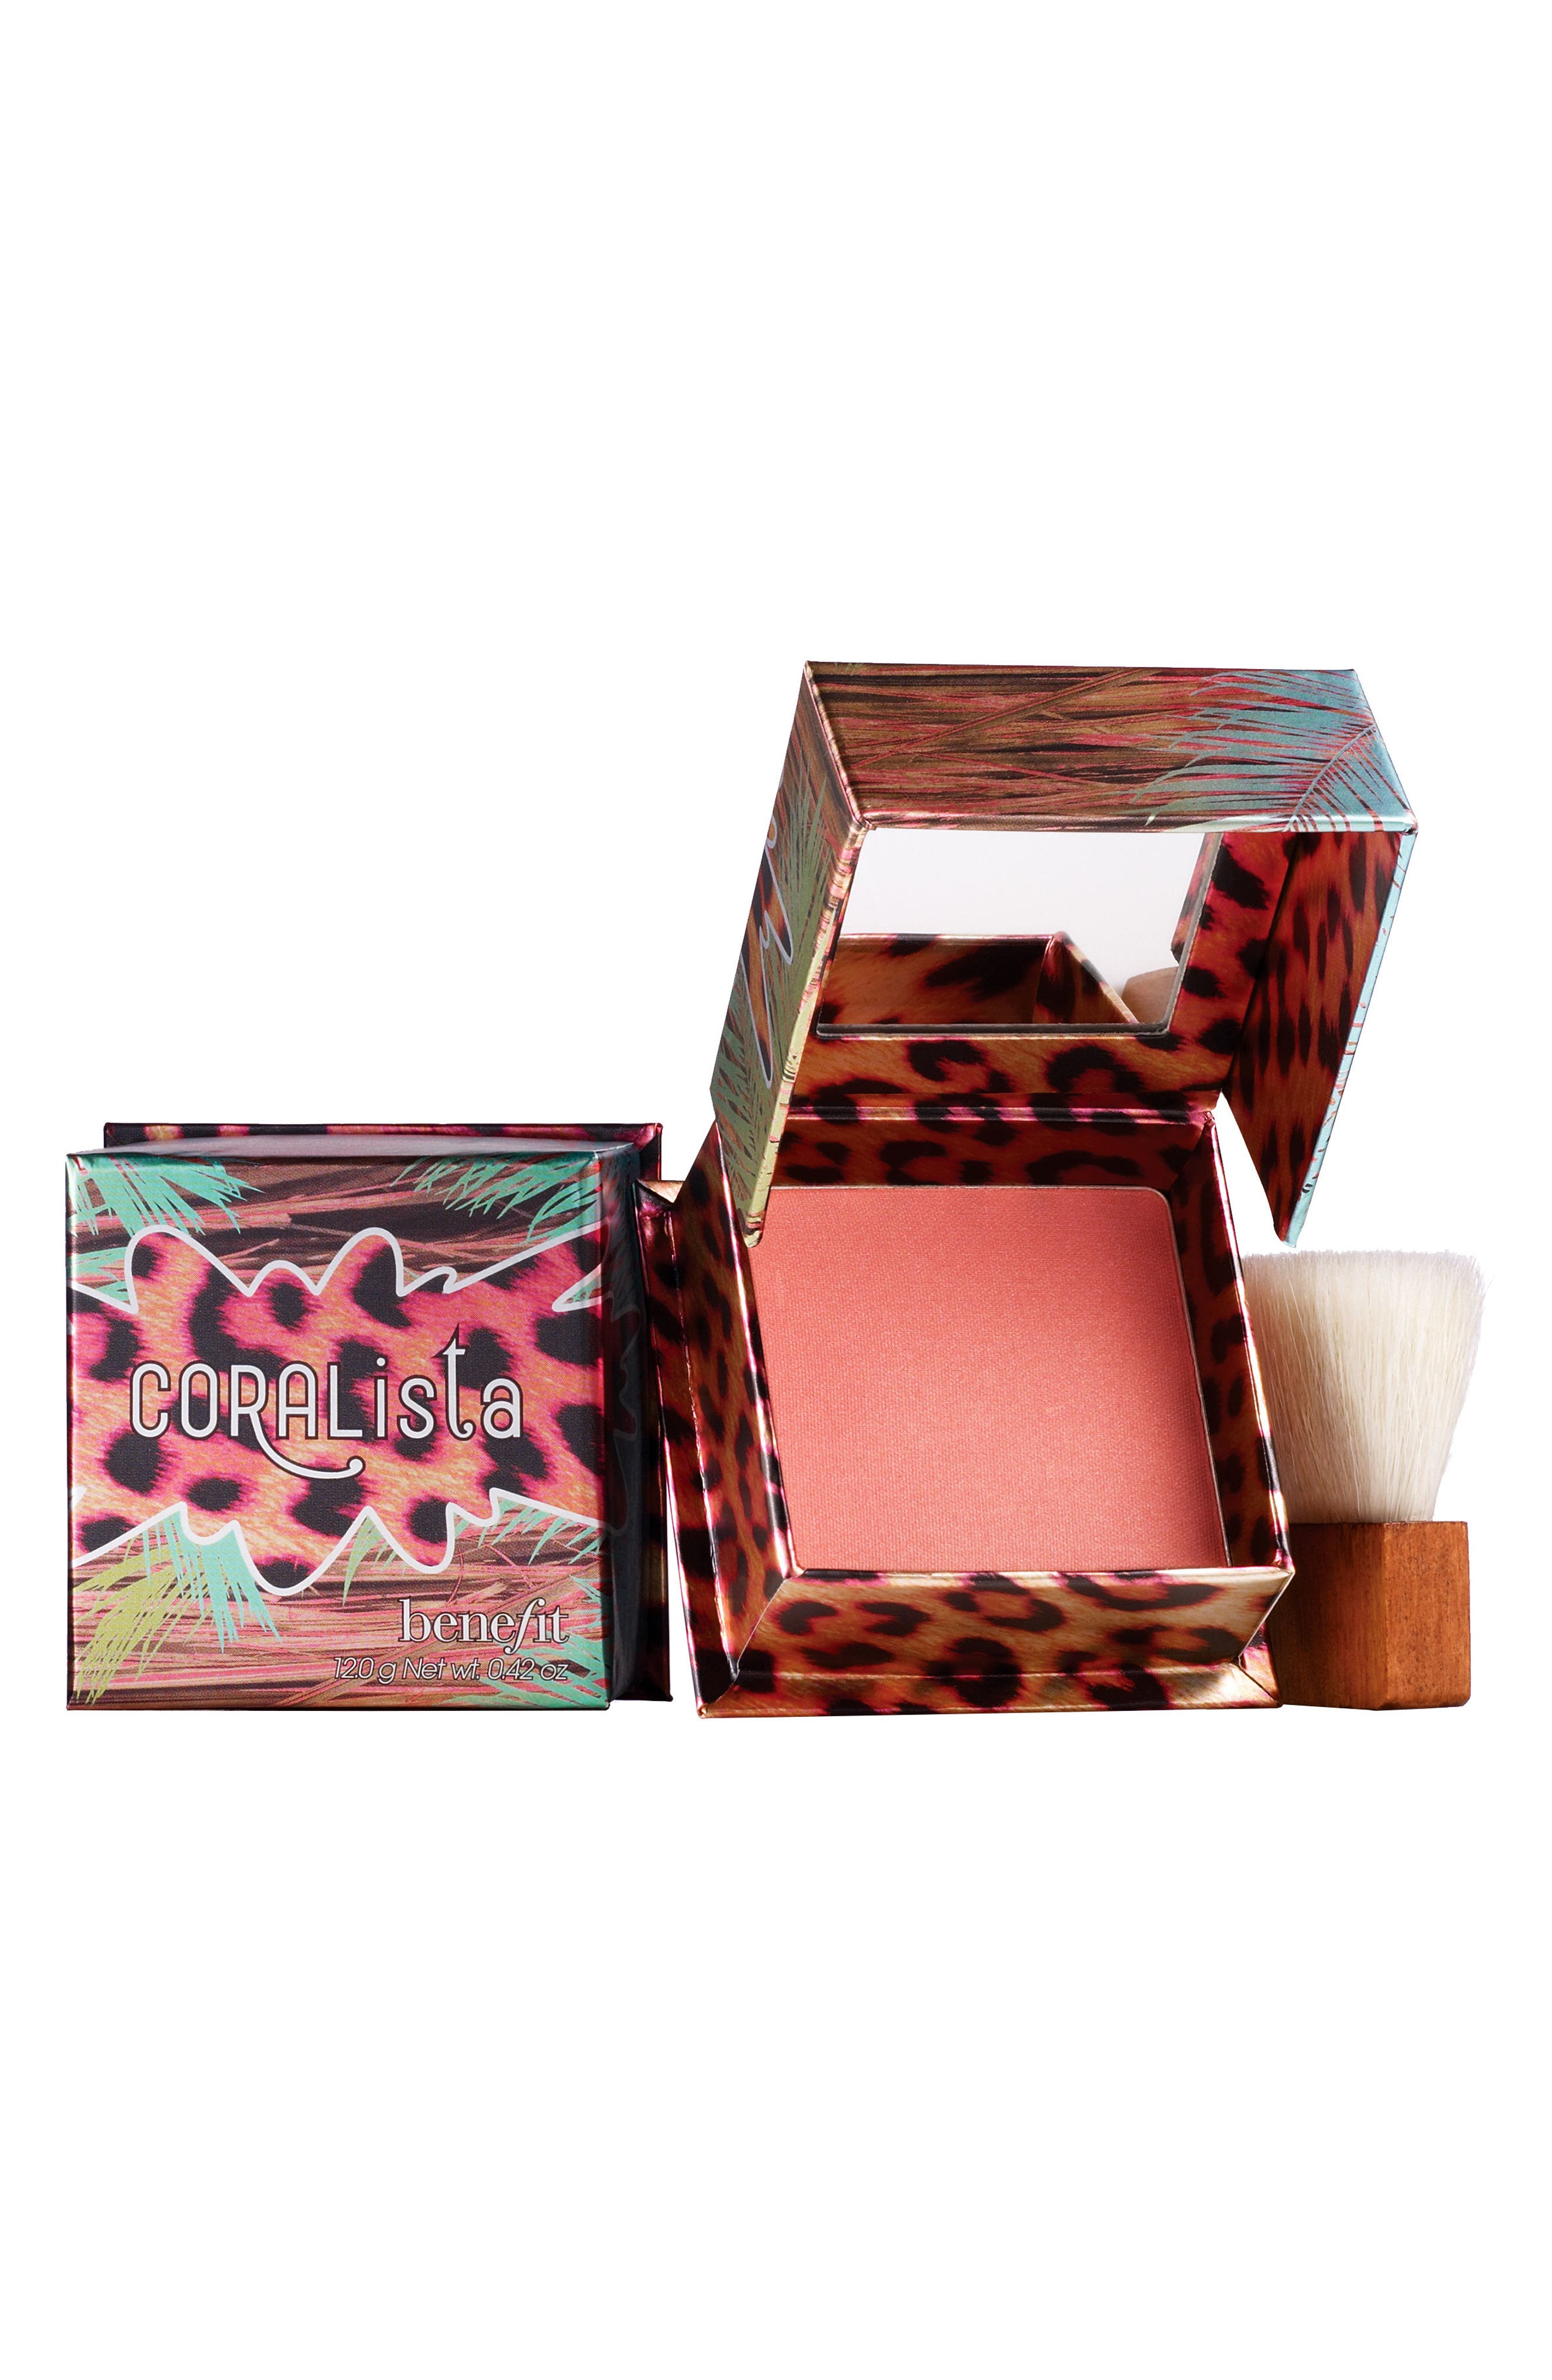 Main Image - Benefit CORALista Coral Powder Blush